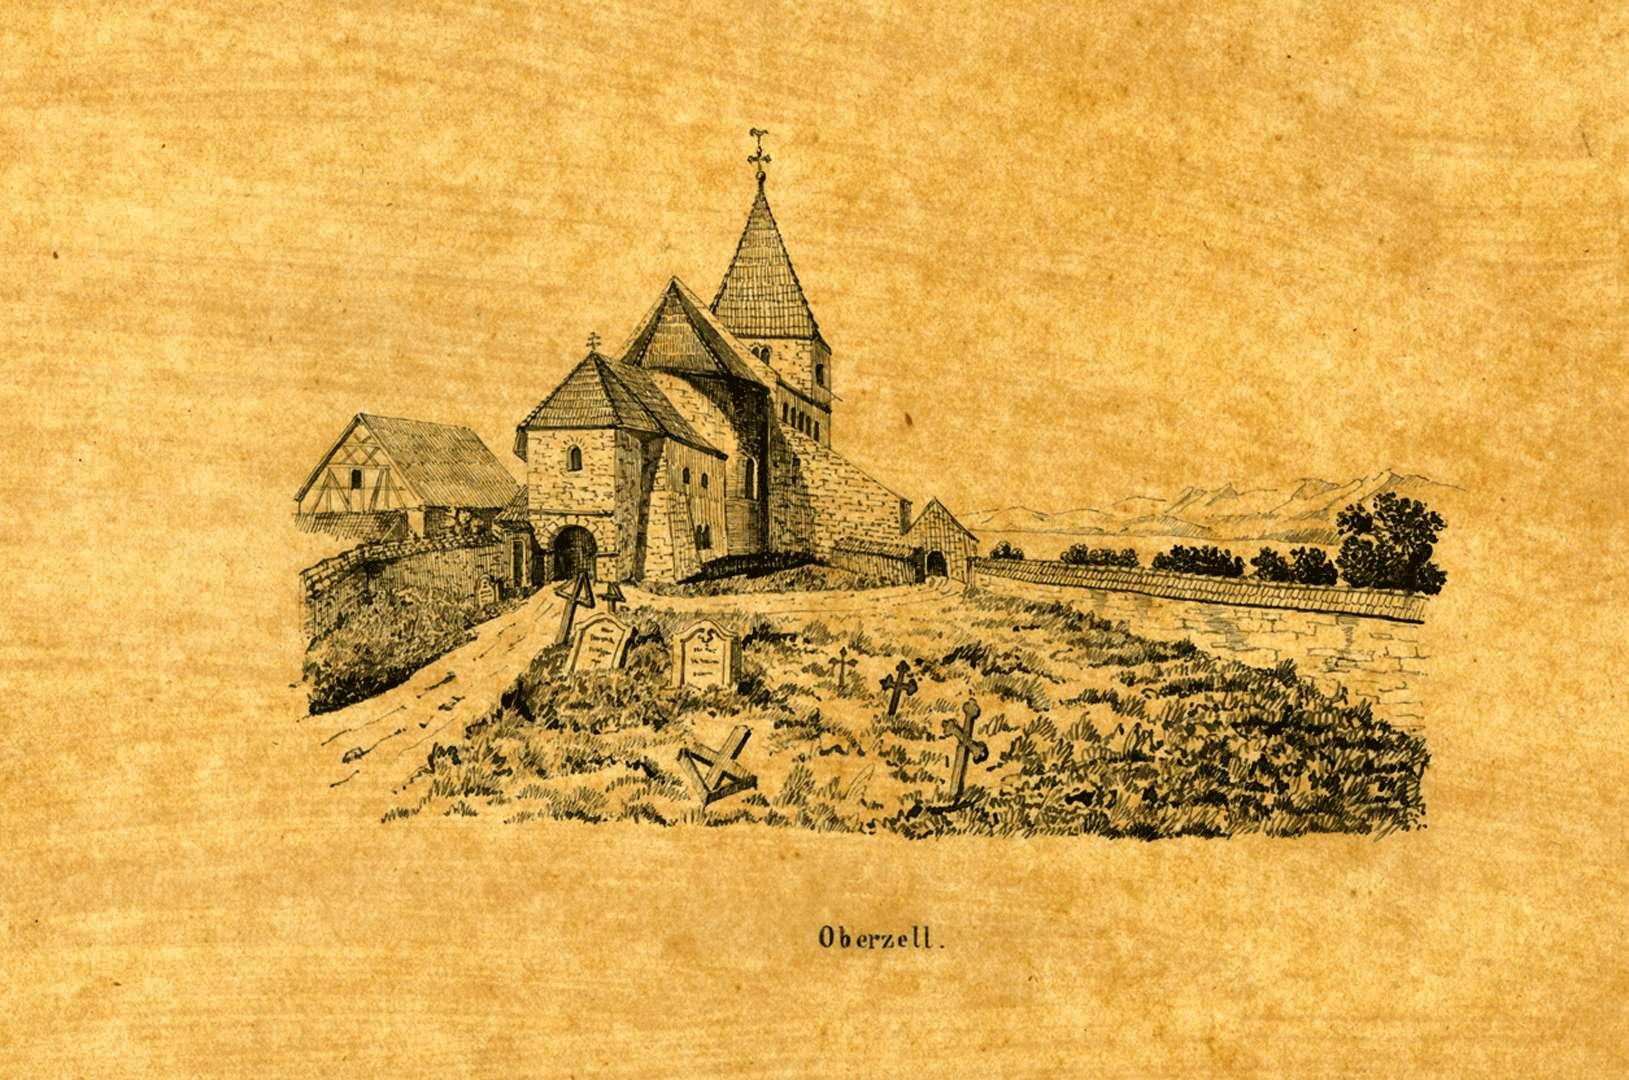 Oberzell, Bild 1